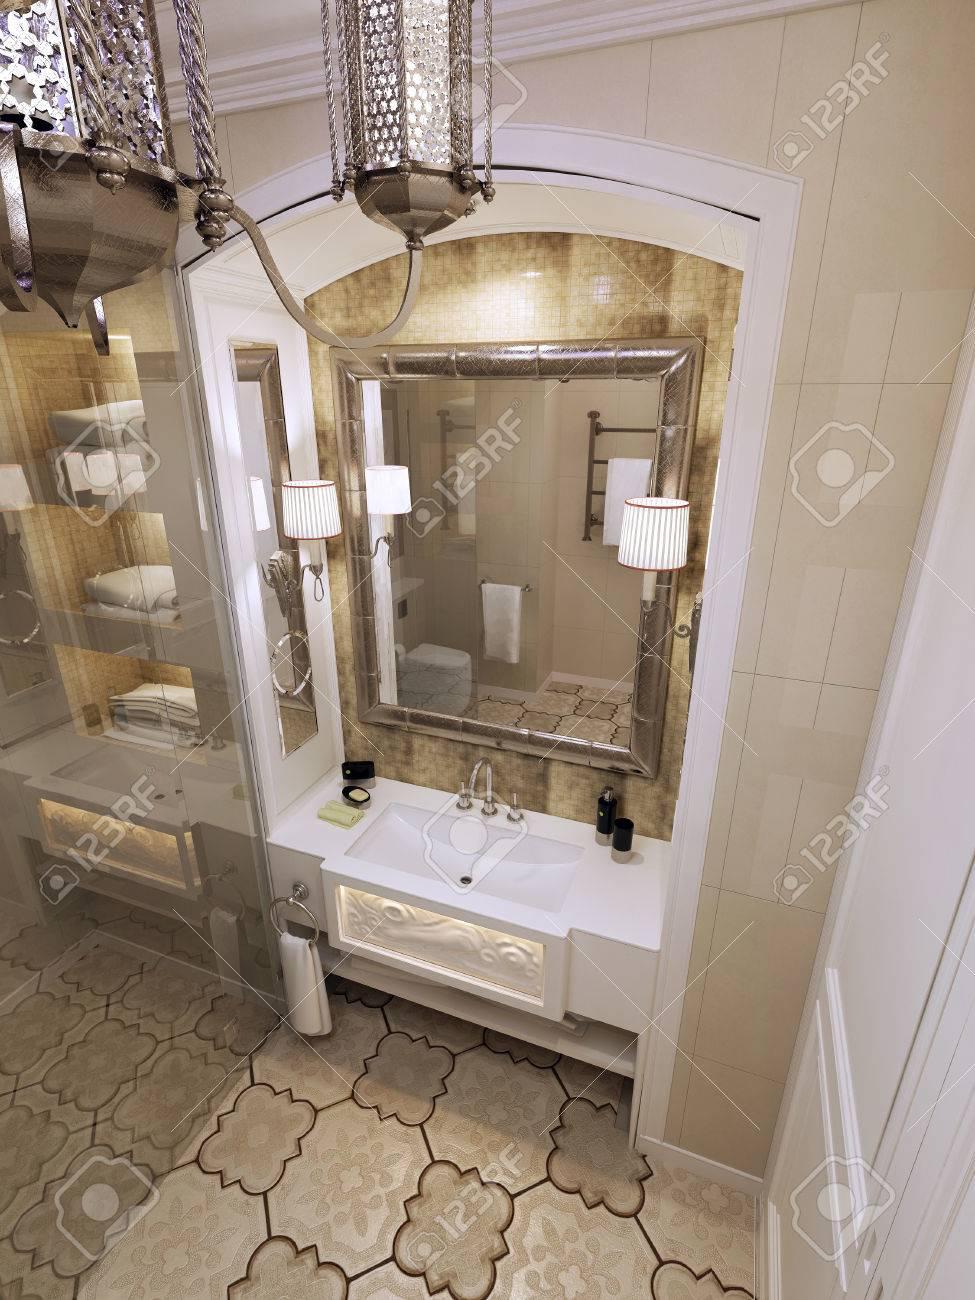 Bathroom moroccan style - Eastern Bathroom Moroccan Style 3d Render Stock Photo 47276972